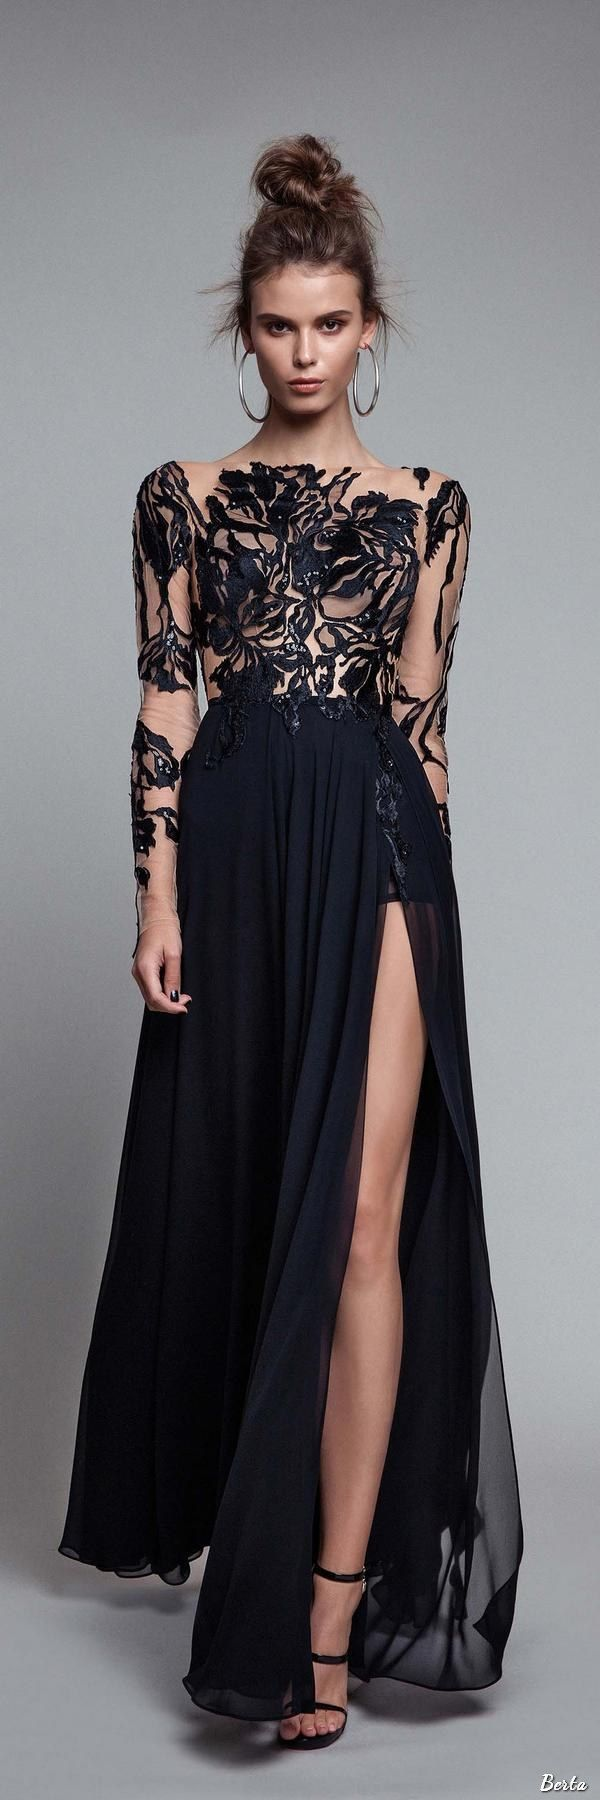 Evening & Prom Dresses | Deer Pearl Flowers / http://www.deerpearlflowers.com/evening-prom-dresses/